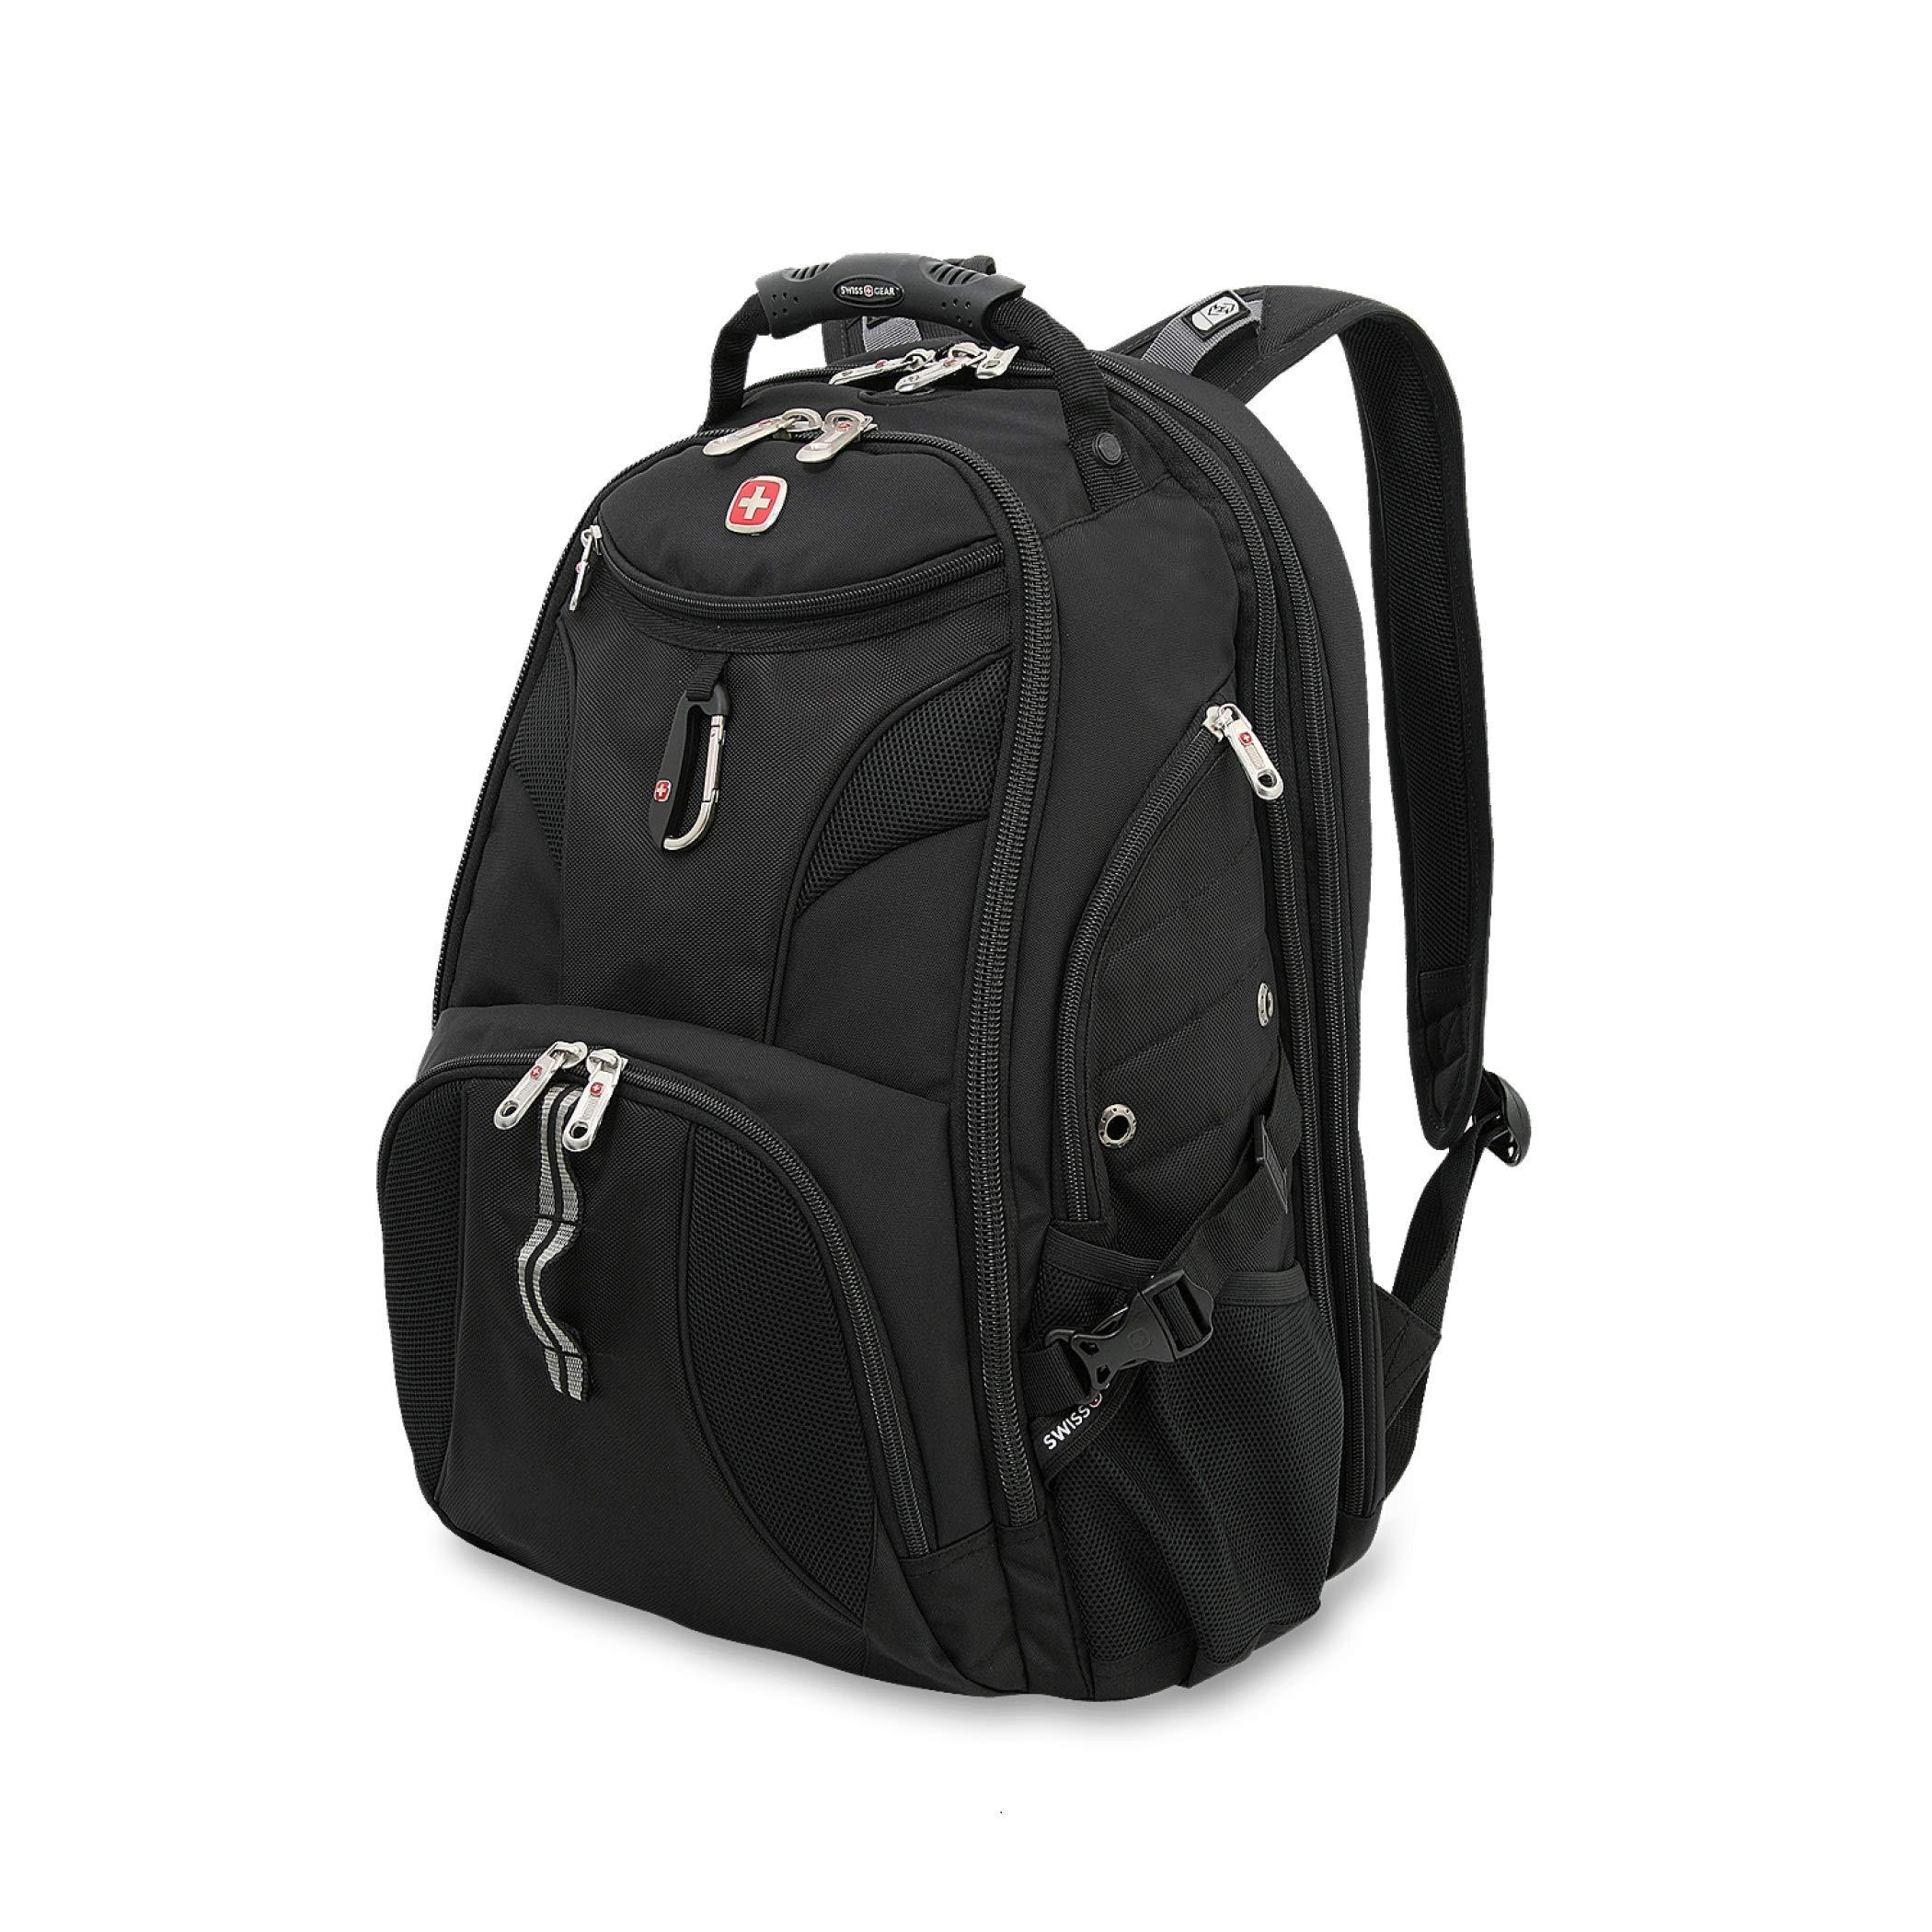 521cc2c4234 SwissGear 1900 Scansmart TSA Laptop Backpack - Black product image